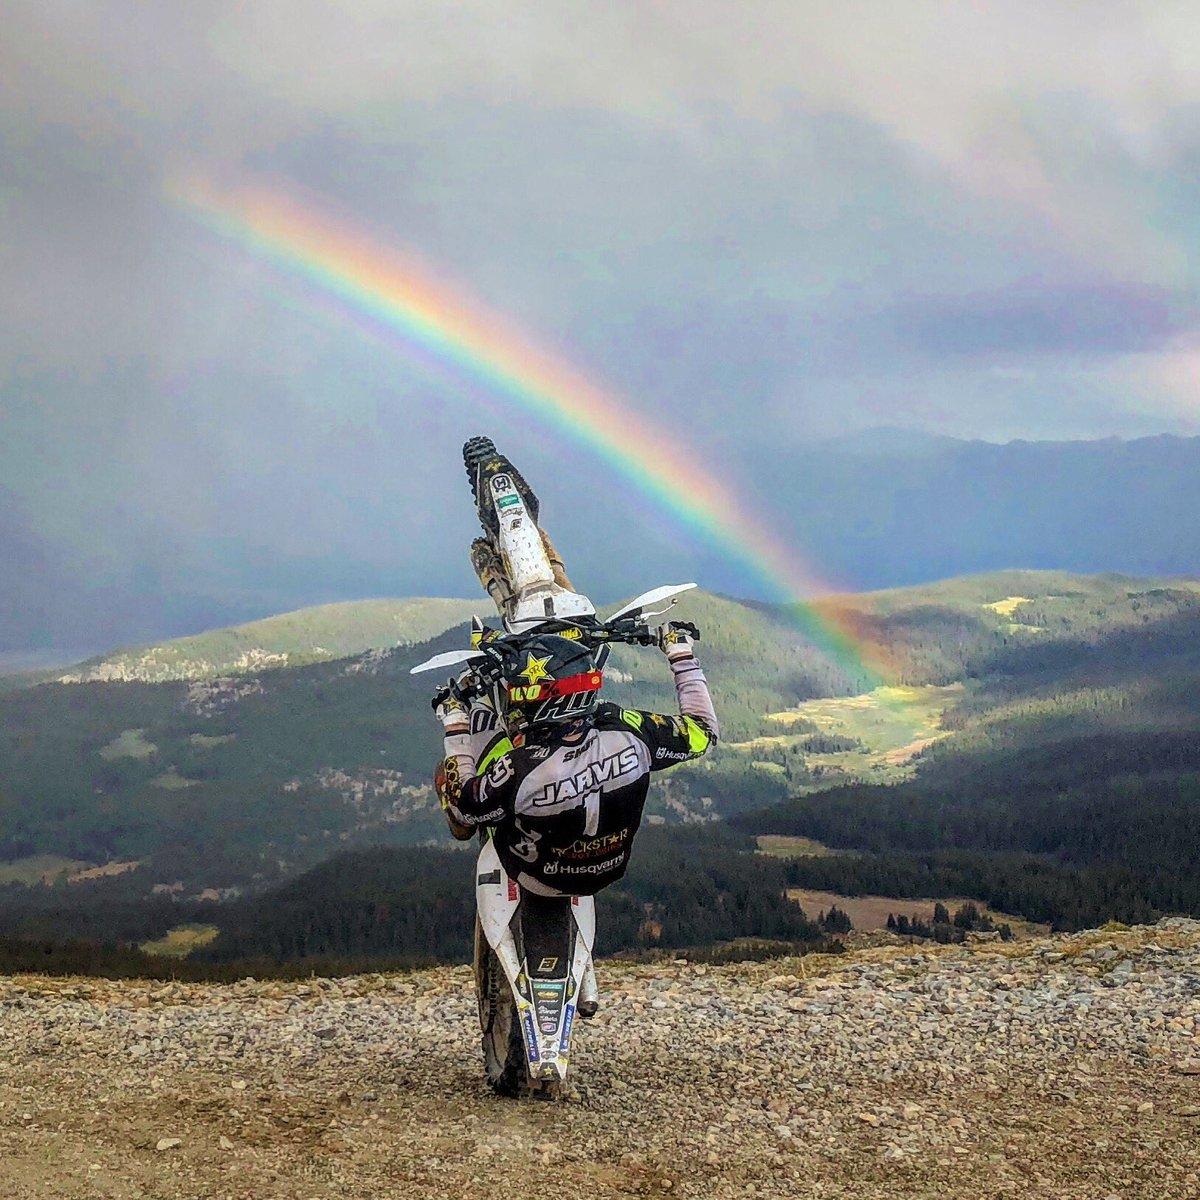 #Colorado #jarvisstyle @Husqvarna1903 @Rockstar_Racing @RawSport93 @AirohHelmet @fmf73 #RockstarHusky https://t.co/pNEg0T87Sv